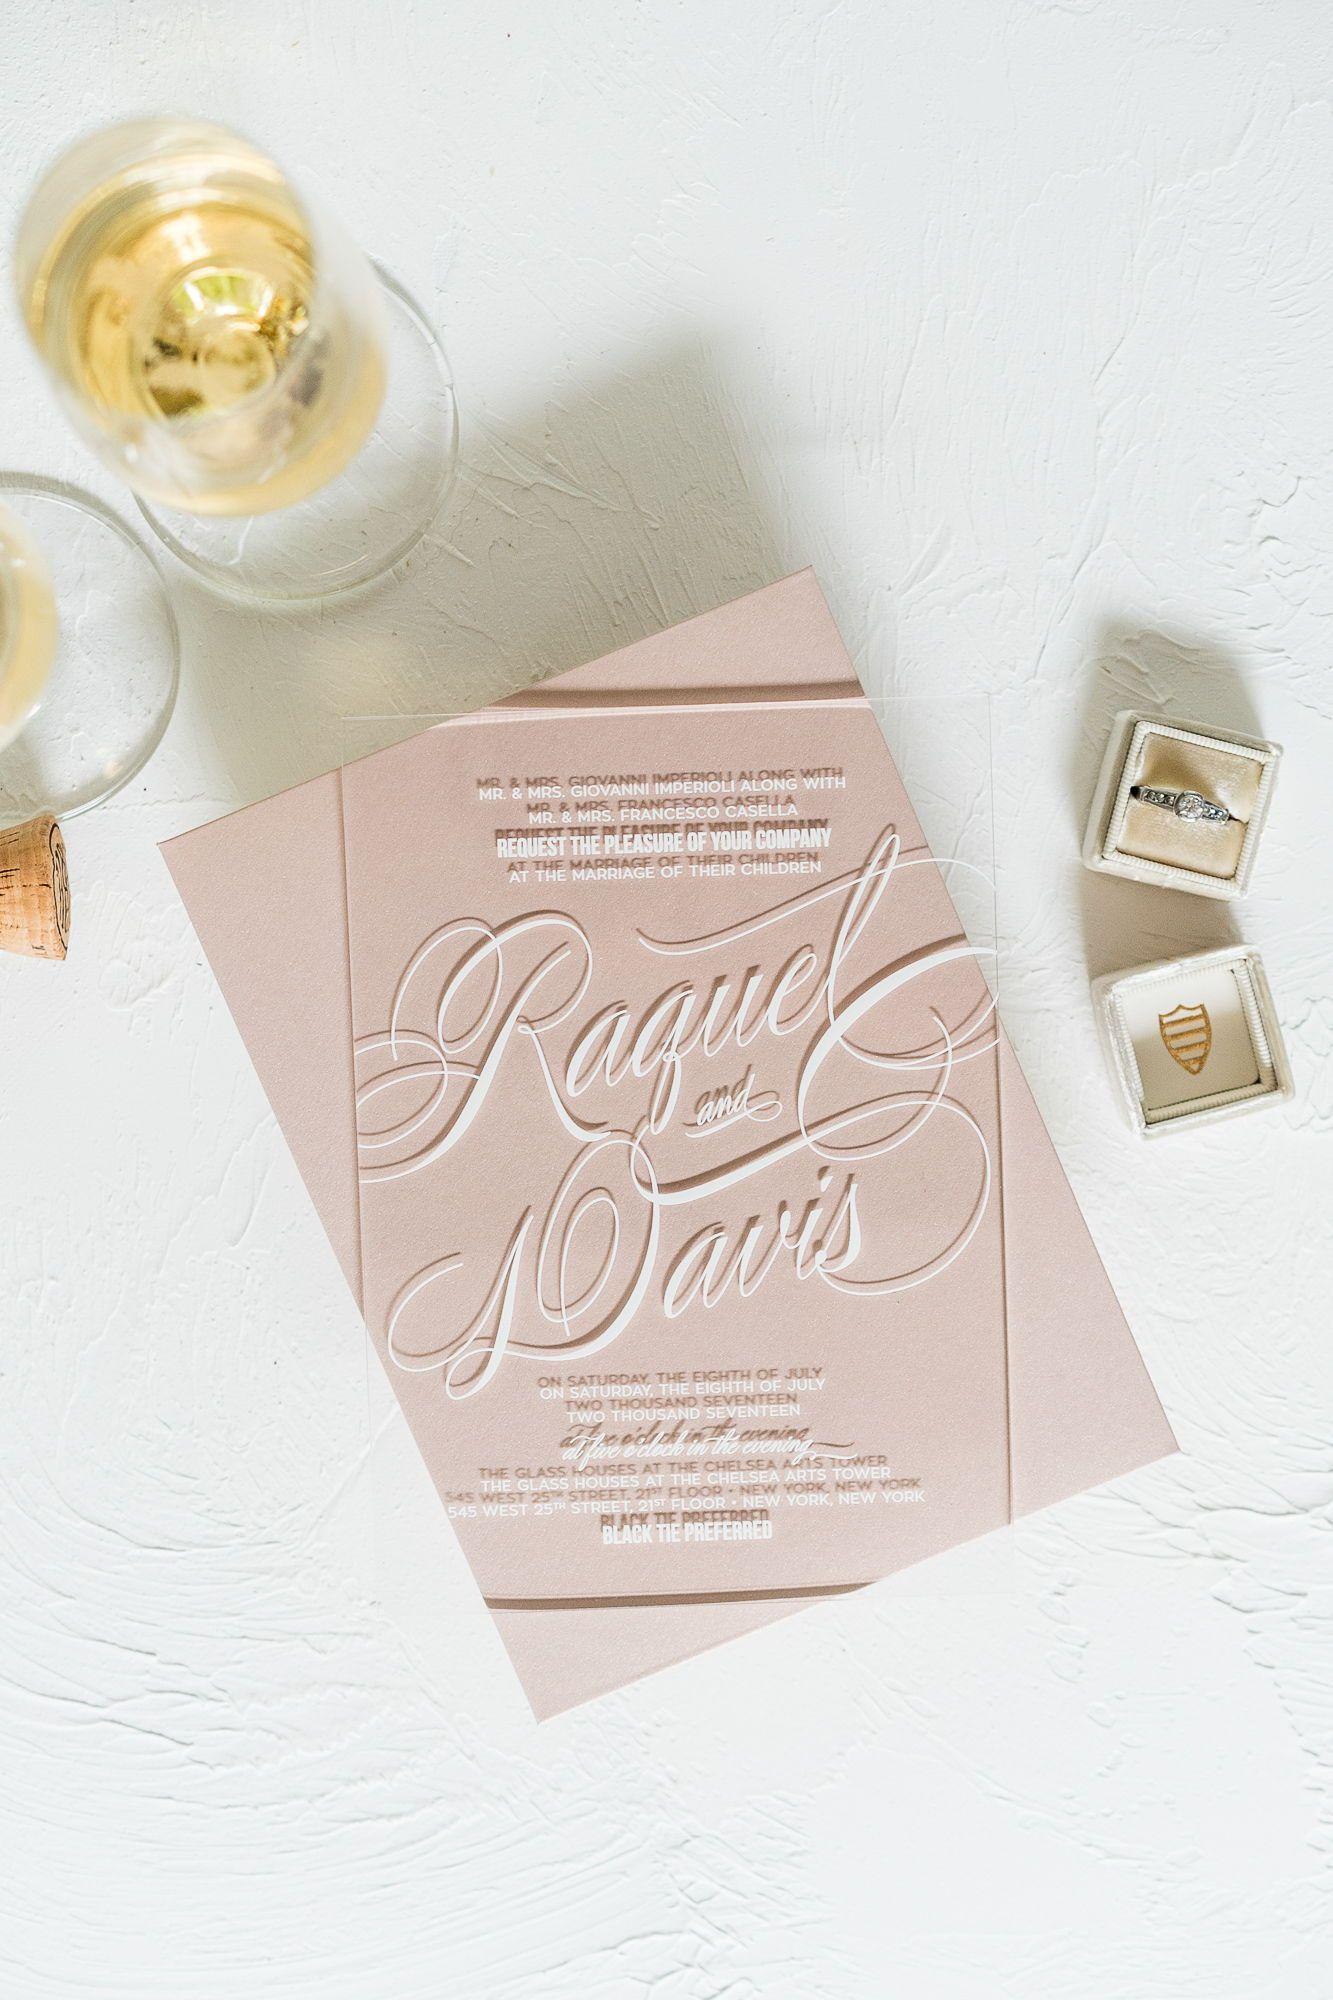 2019 Wedding Invitation Trends Acrylic Wedding Invitations Affordable Acrylic Inv Fun Wedding Invitations Wedding Invitation Trends Order Wedding Invitations